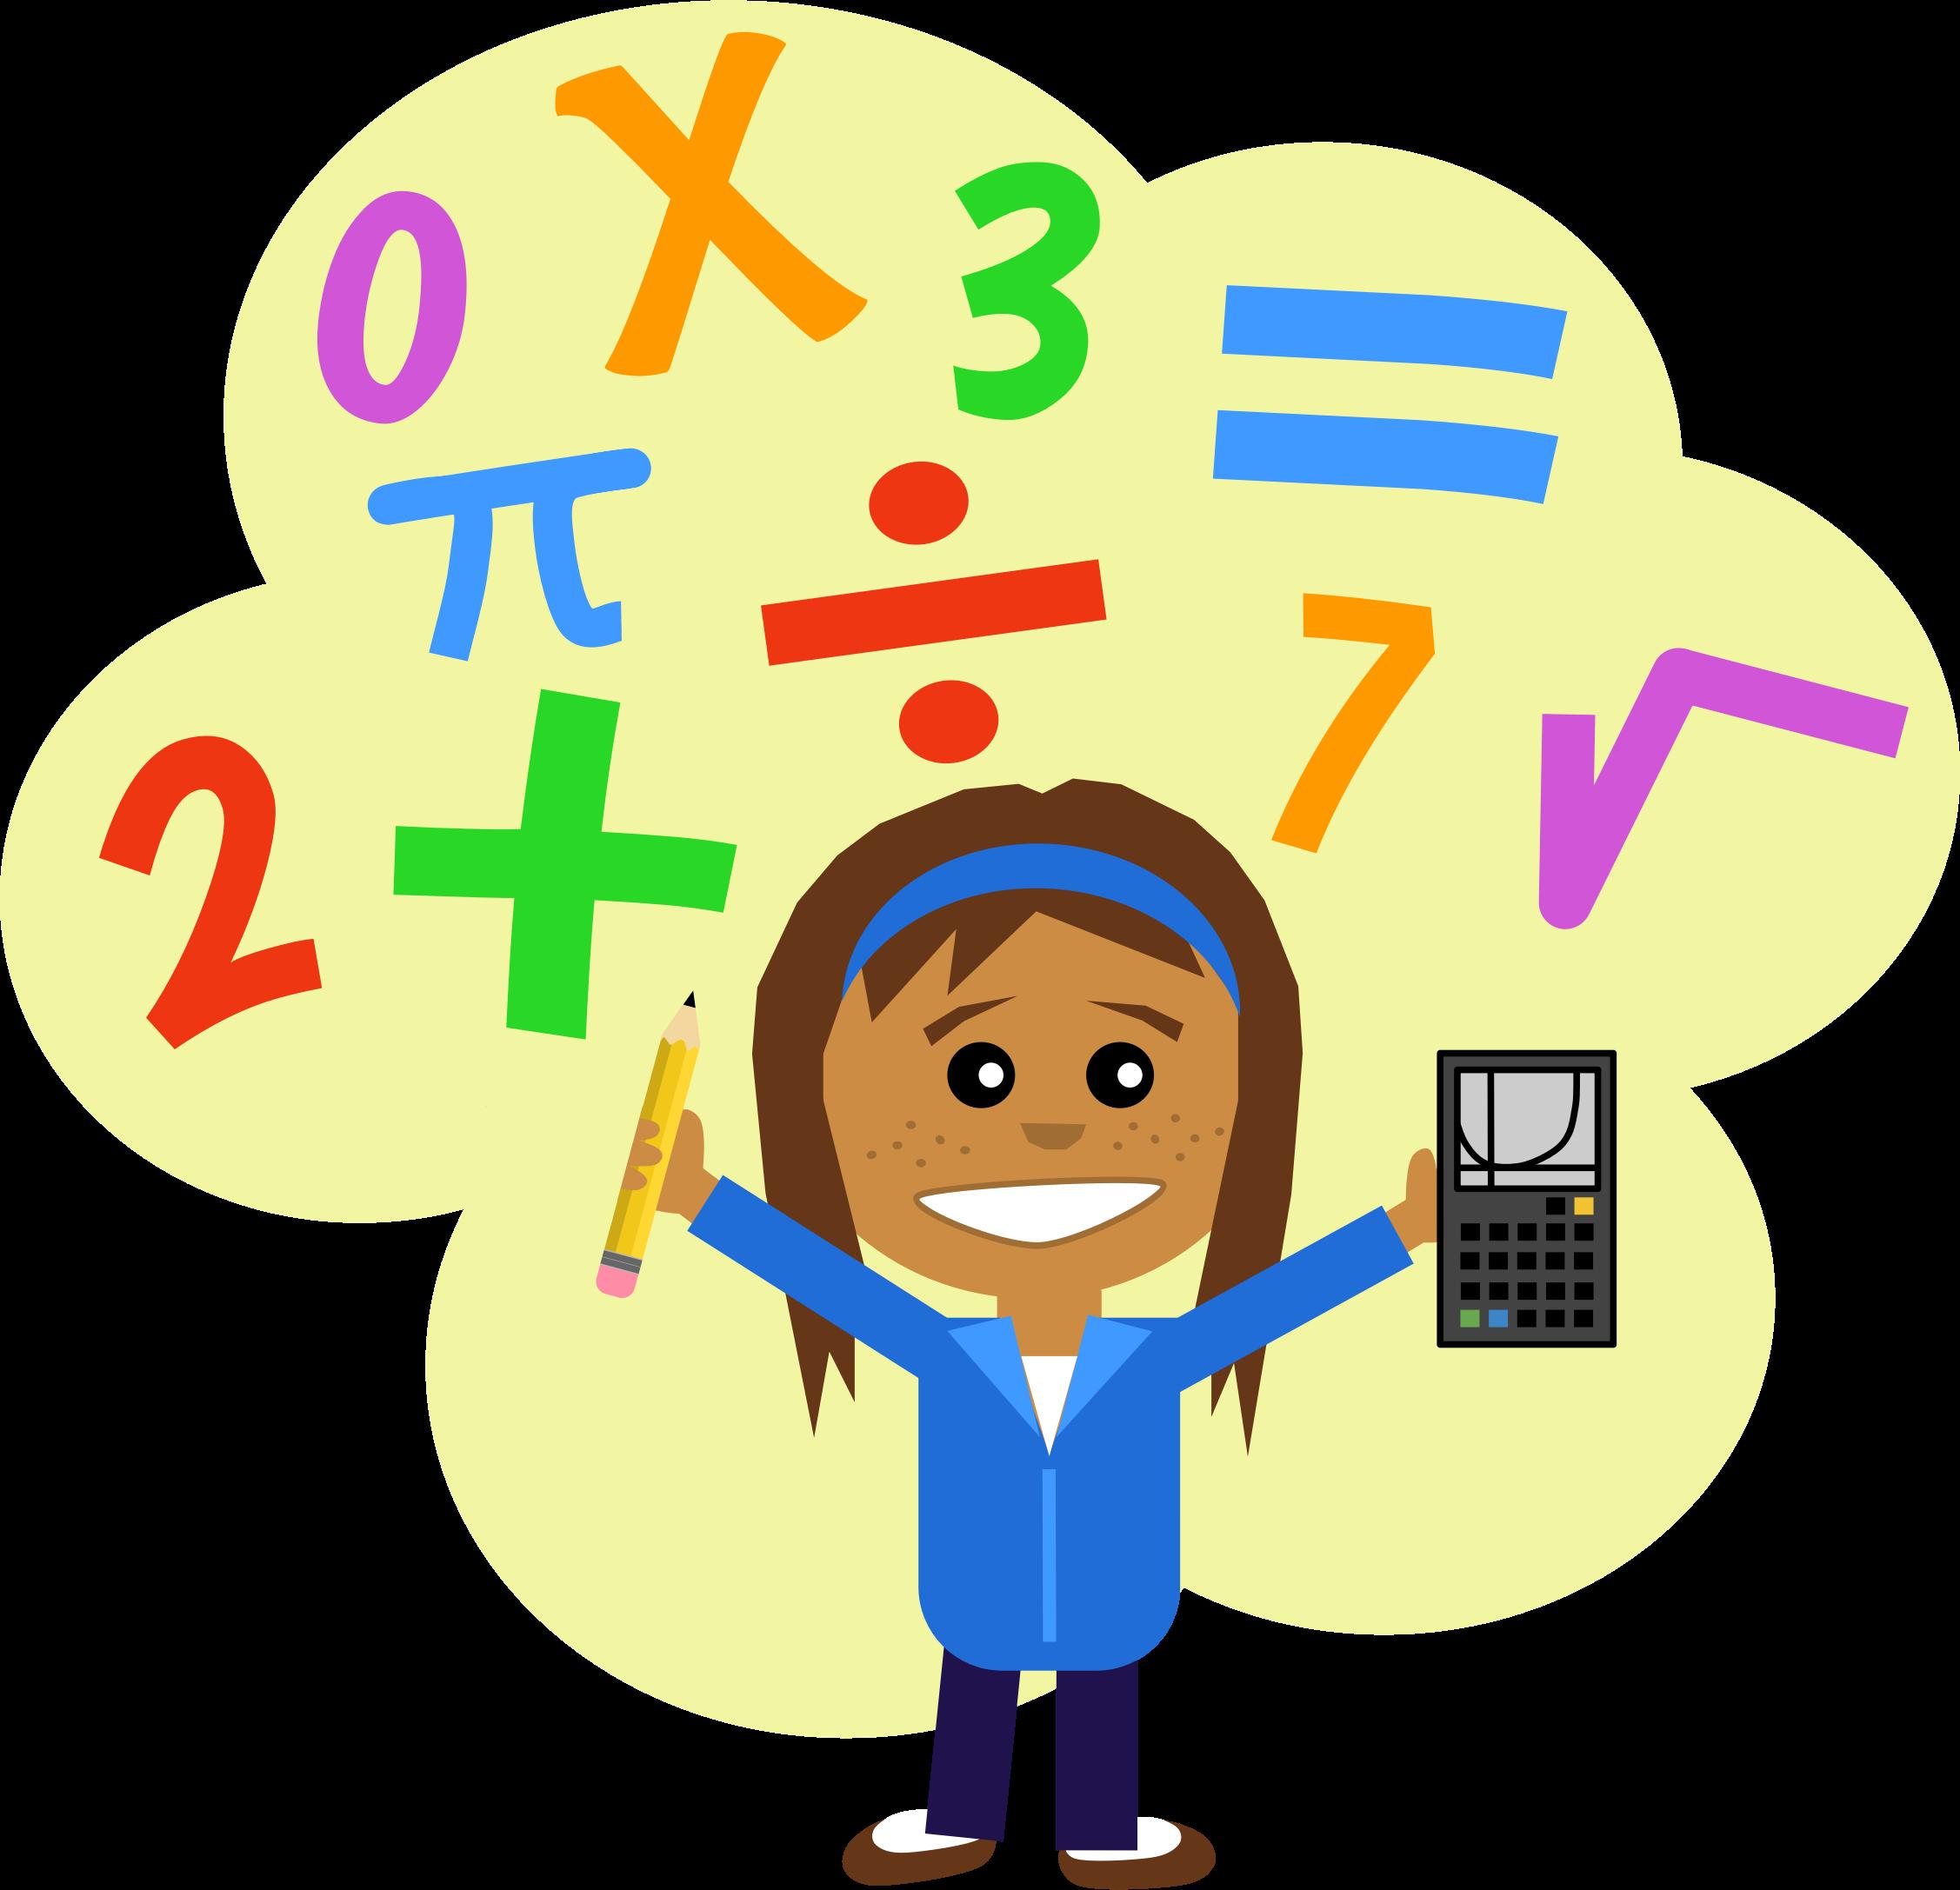 Worksheet Learn Basic Math Online Free learn basic math online free scalien scalien